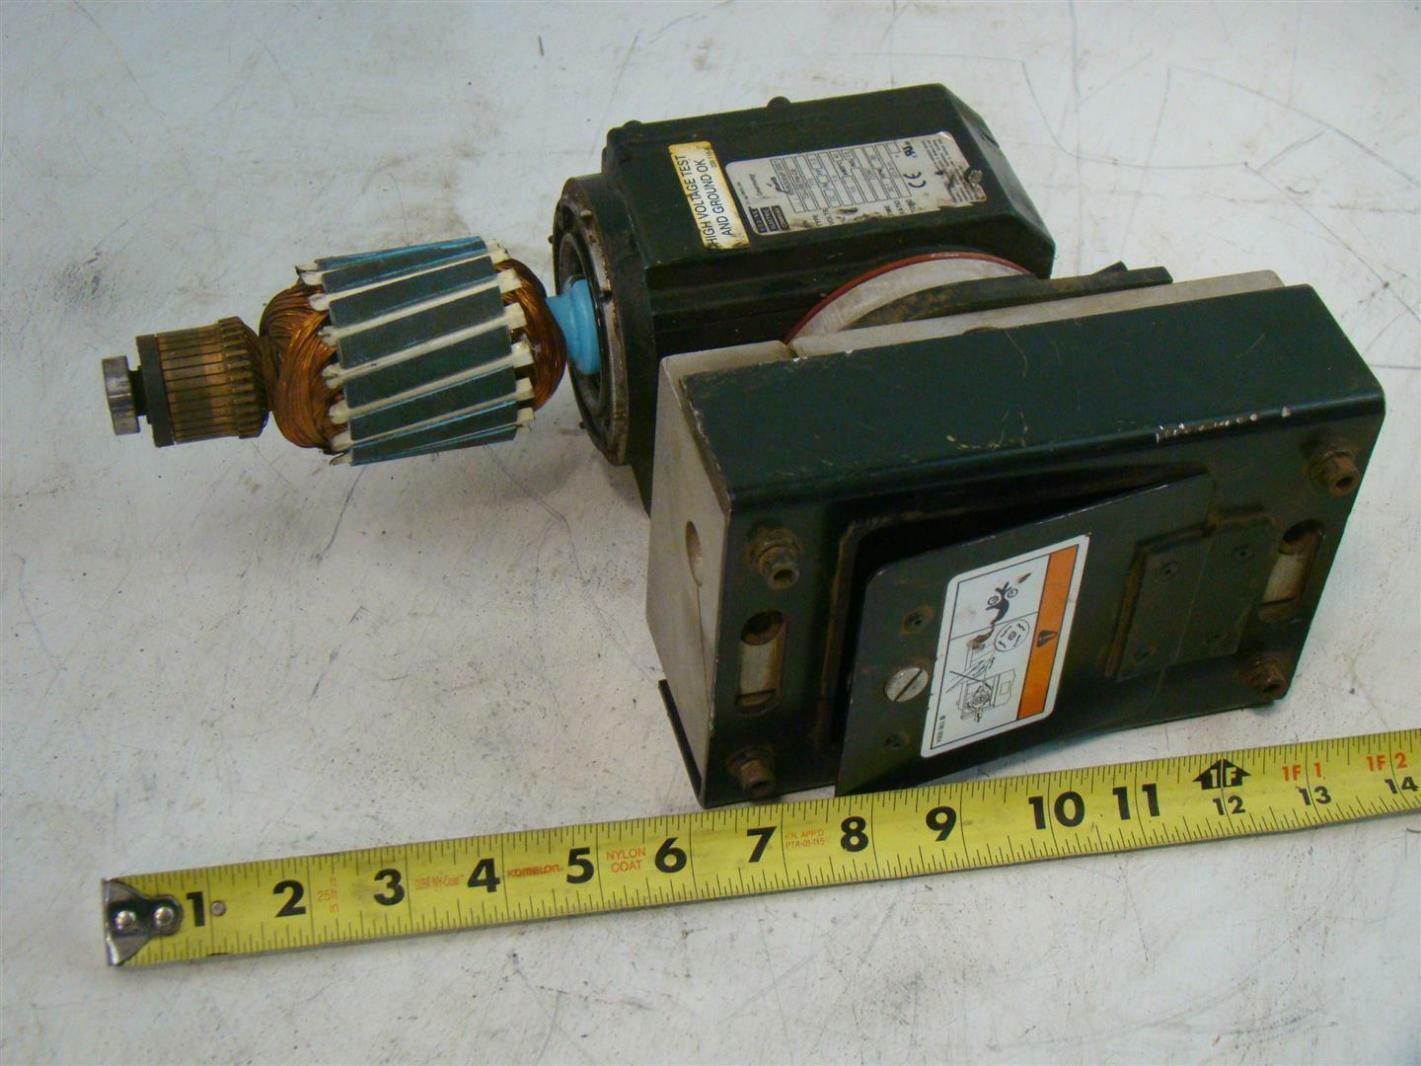 Bodine Electric Rohs Gearmotor M5k0069f0001 33a5bepm Gb